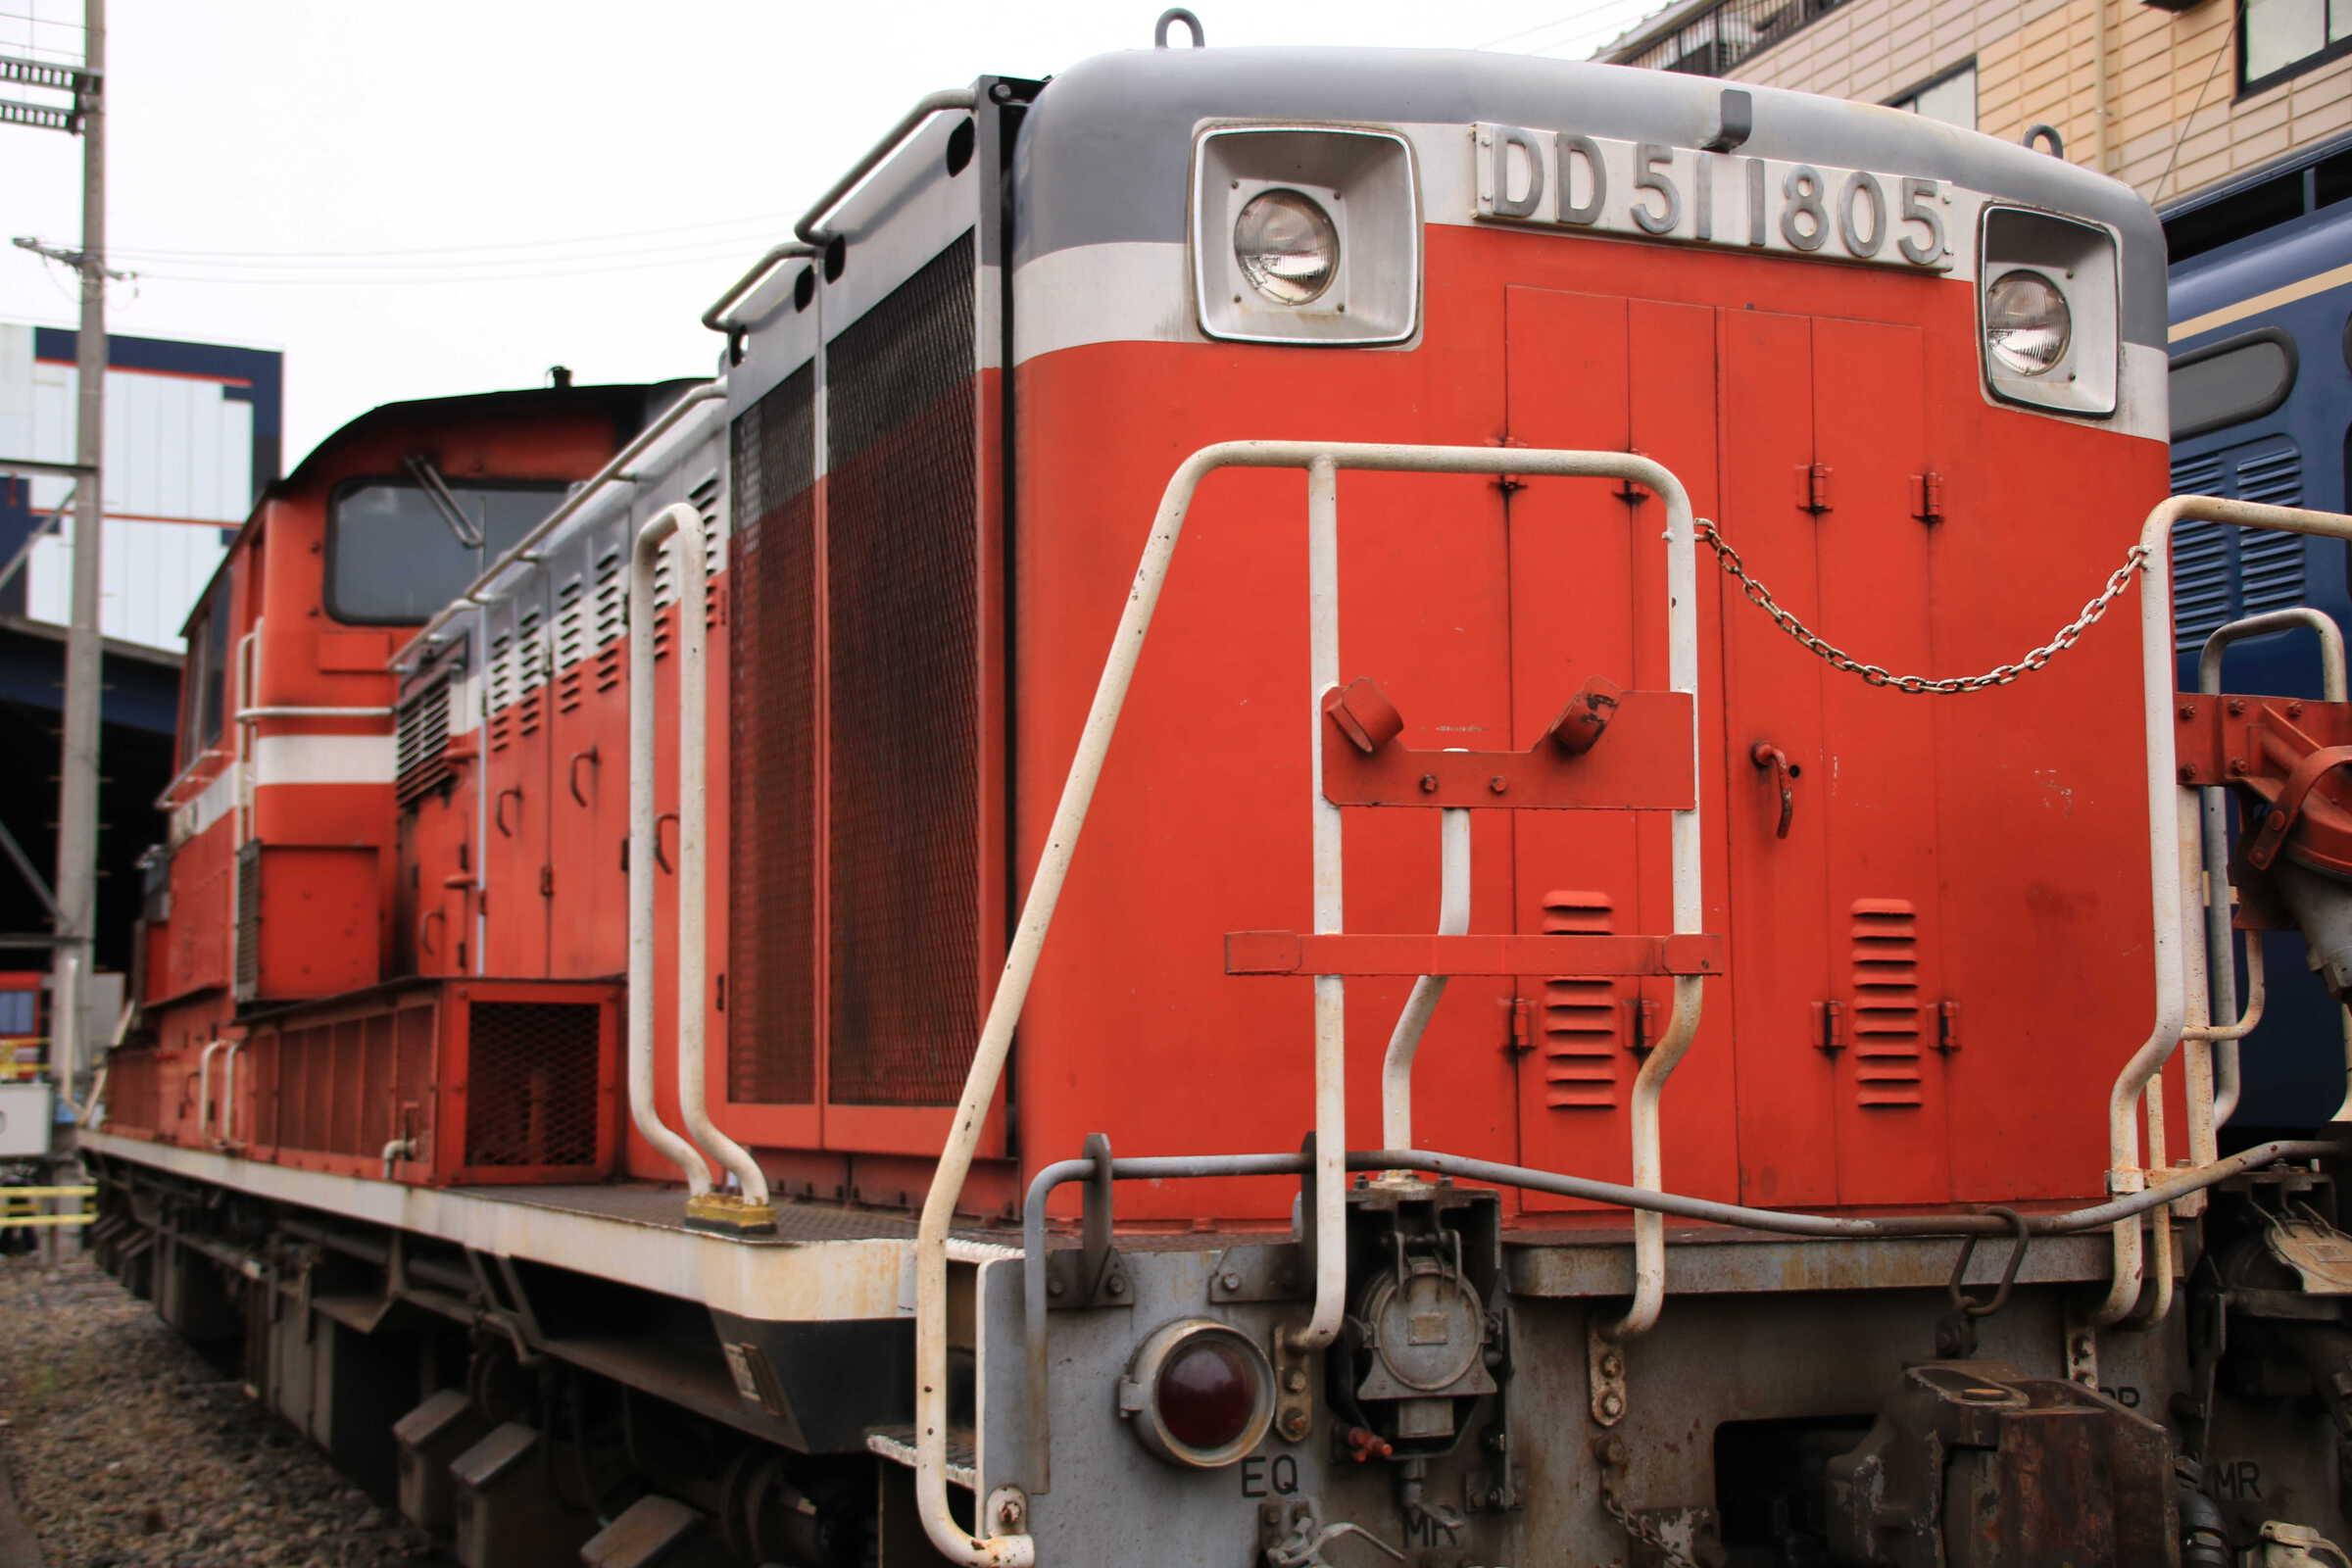 DD51-1805